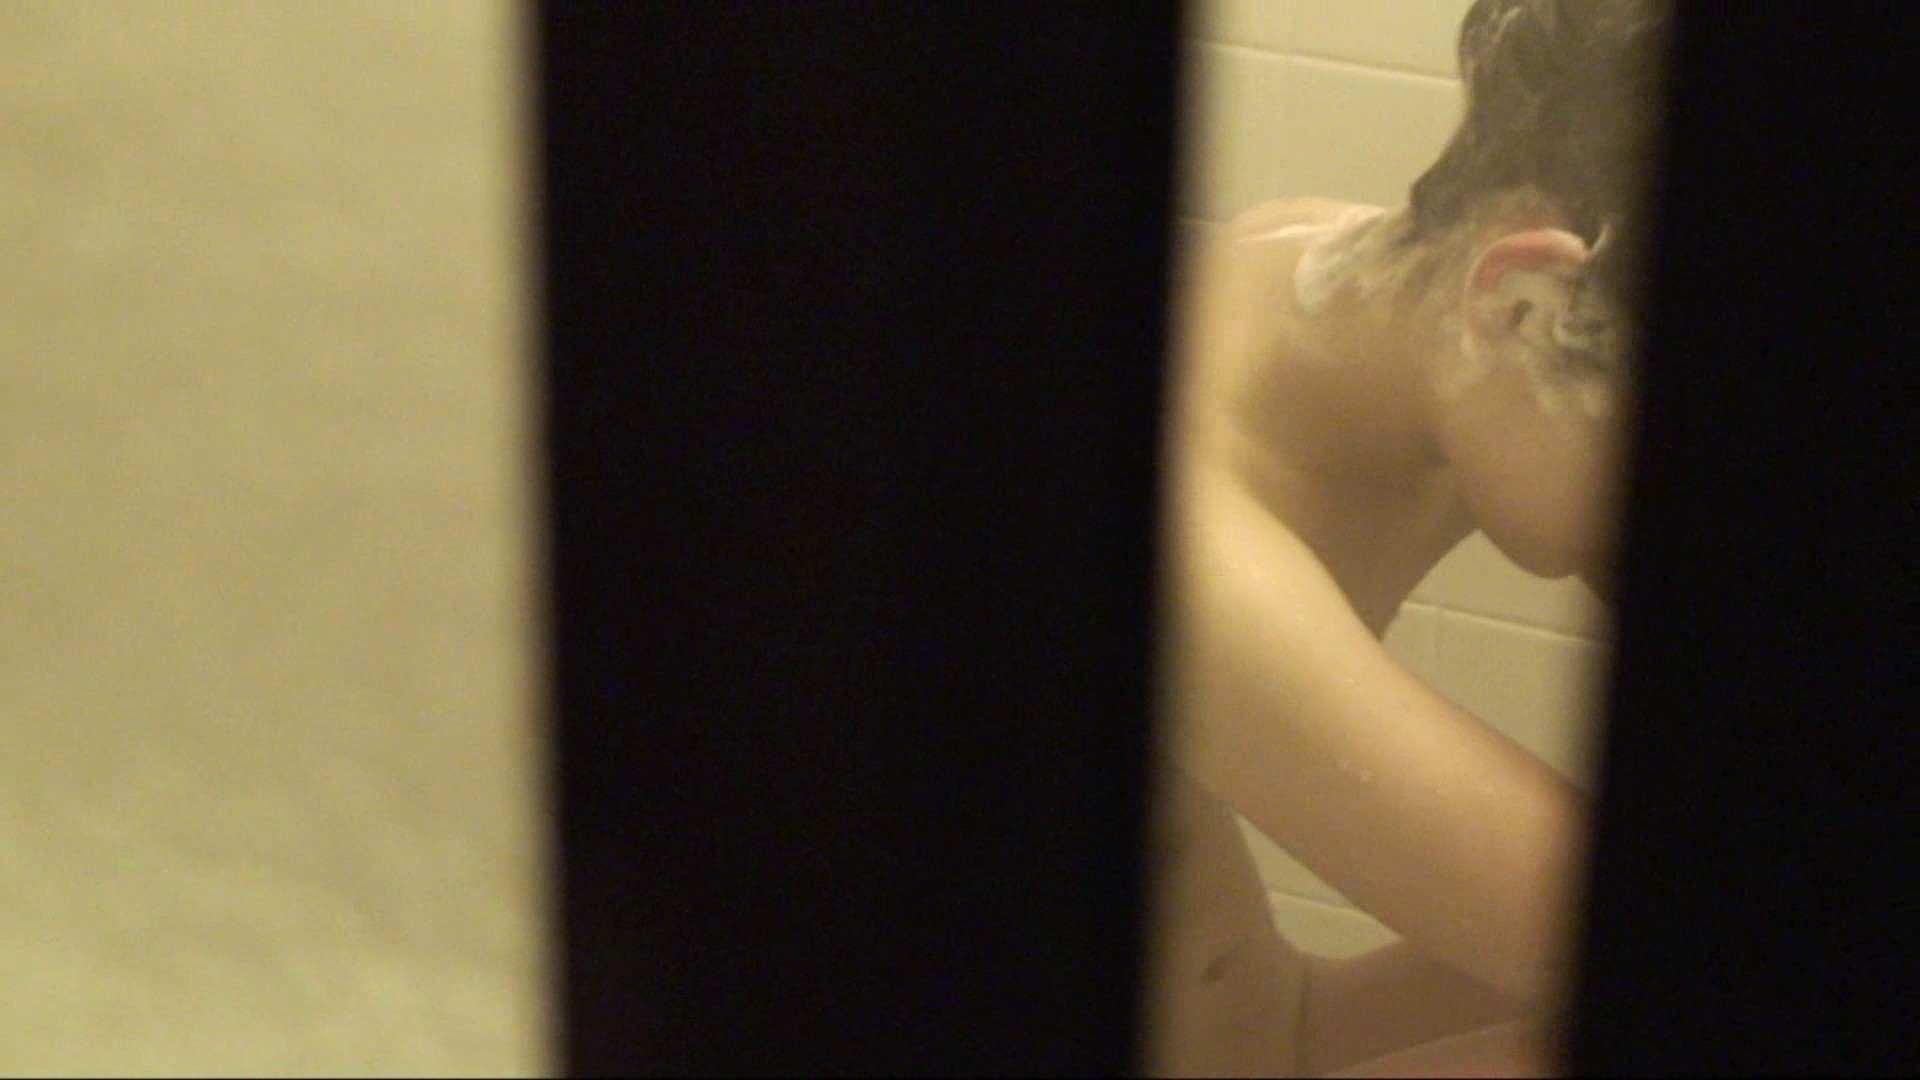 vol.02超可愛すぎる彼女の裸体をハイビジョンで!至近距離での眺め最高! 美人 スケベ動画紹介 54pic 13